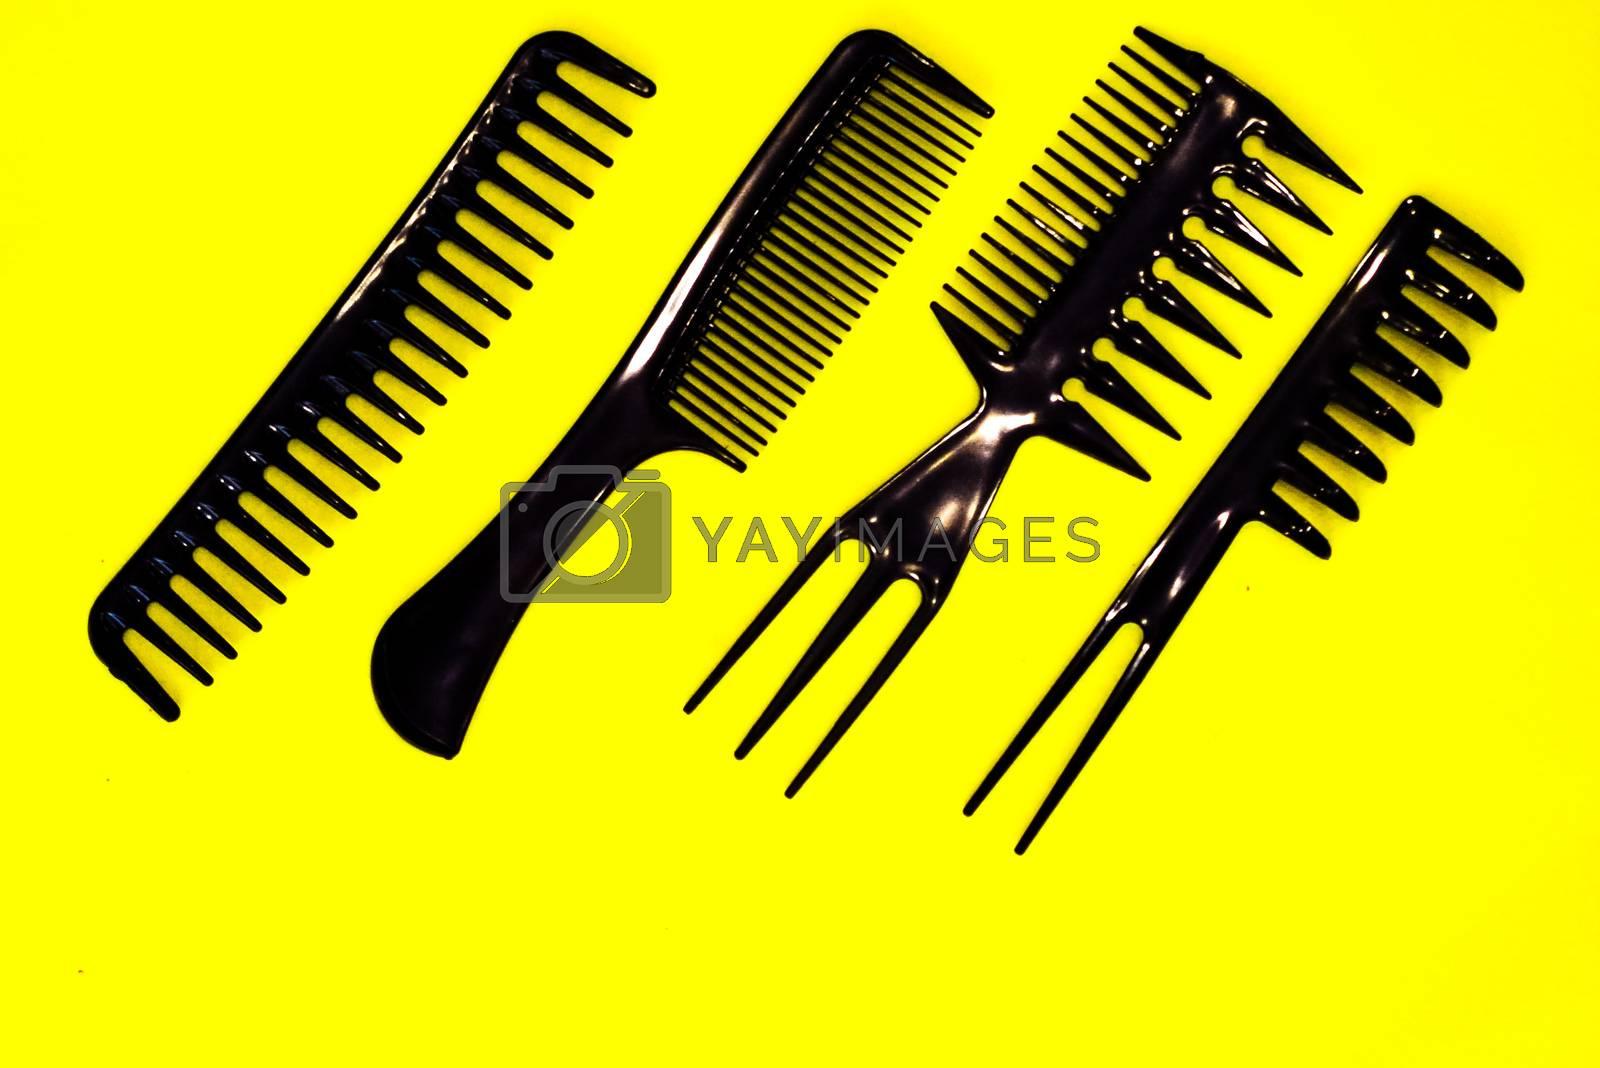 Royalty free image of black hairbrush set for professional hairdresser by alexandr_sorokin